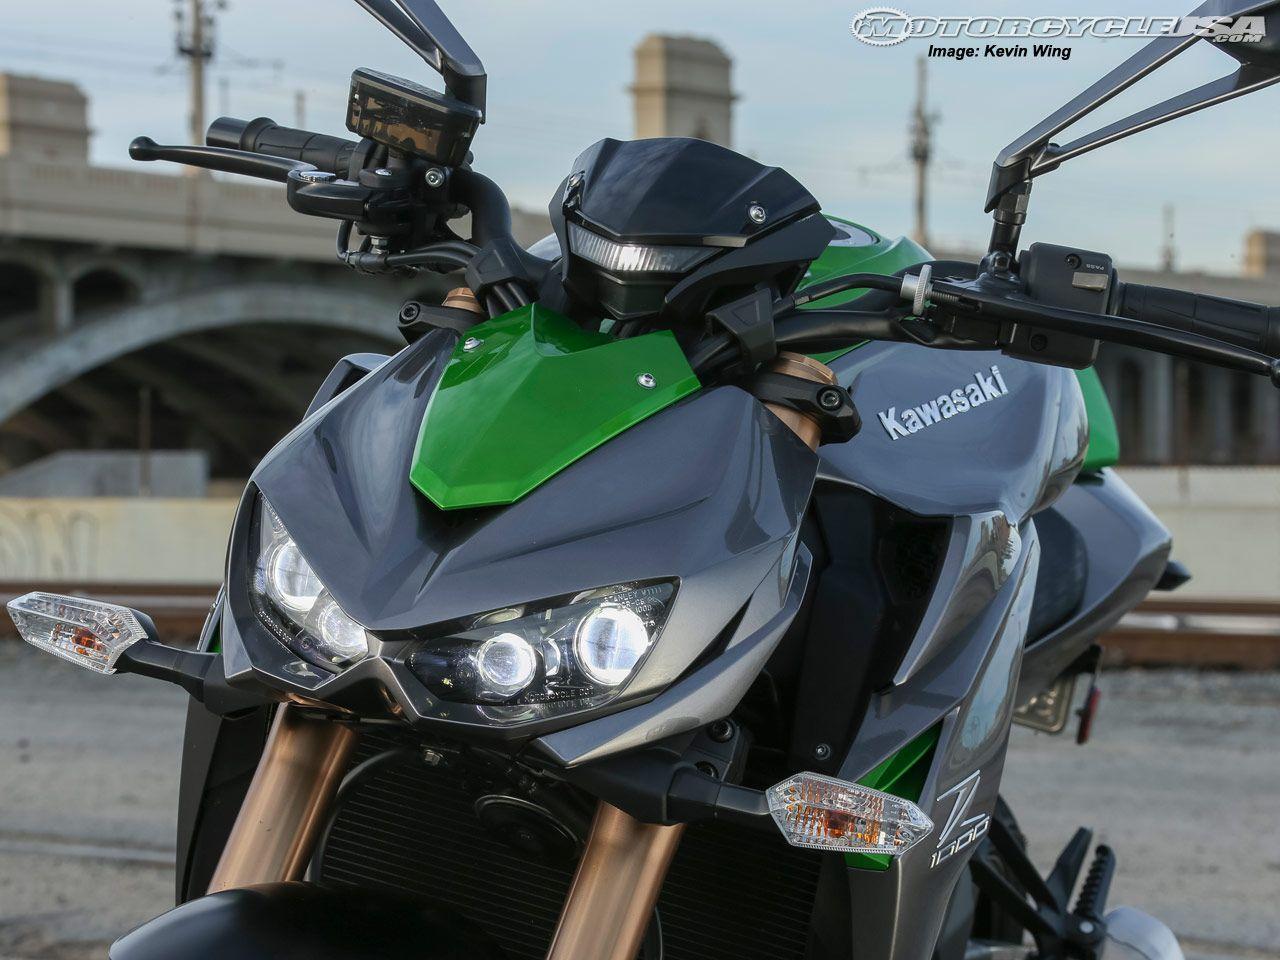 Kawasaki Z100 2014 | Motorcycles <3 | Pinterest | Kawasaki z1000